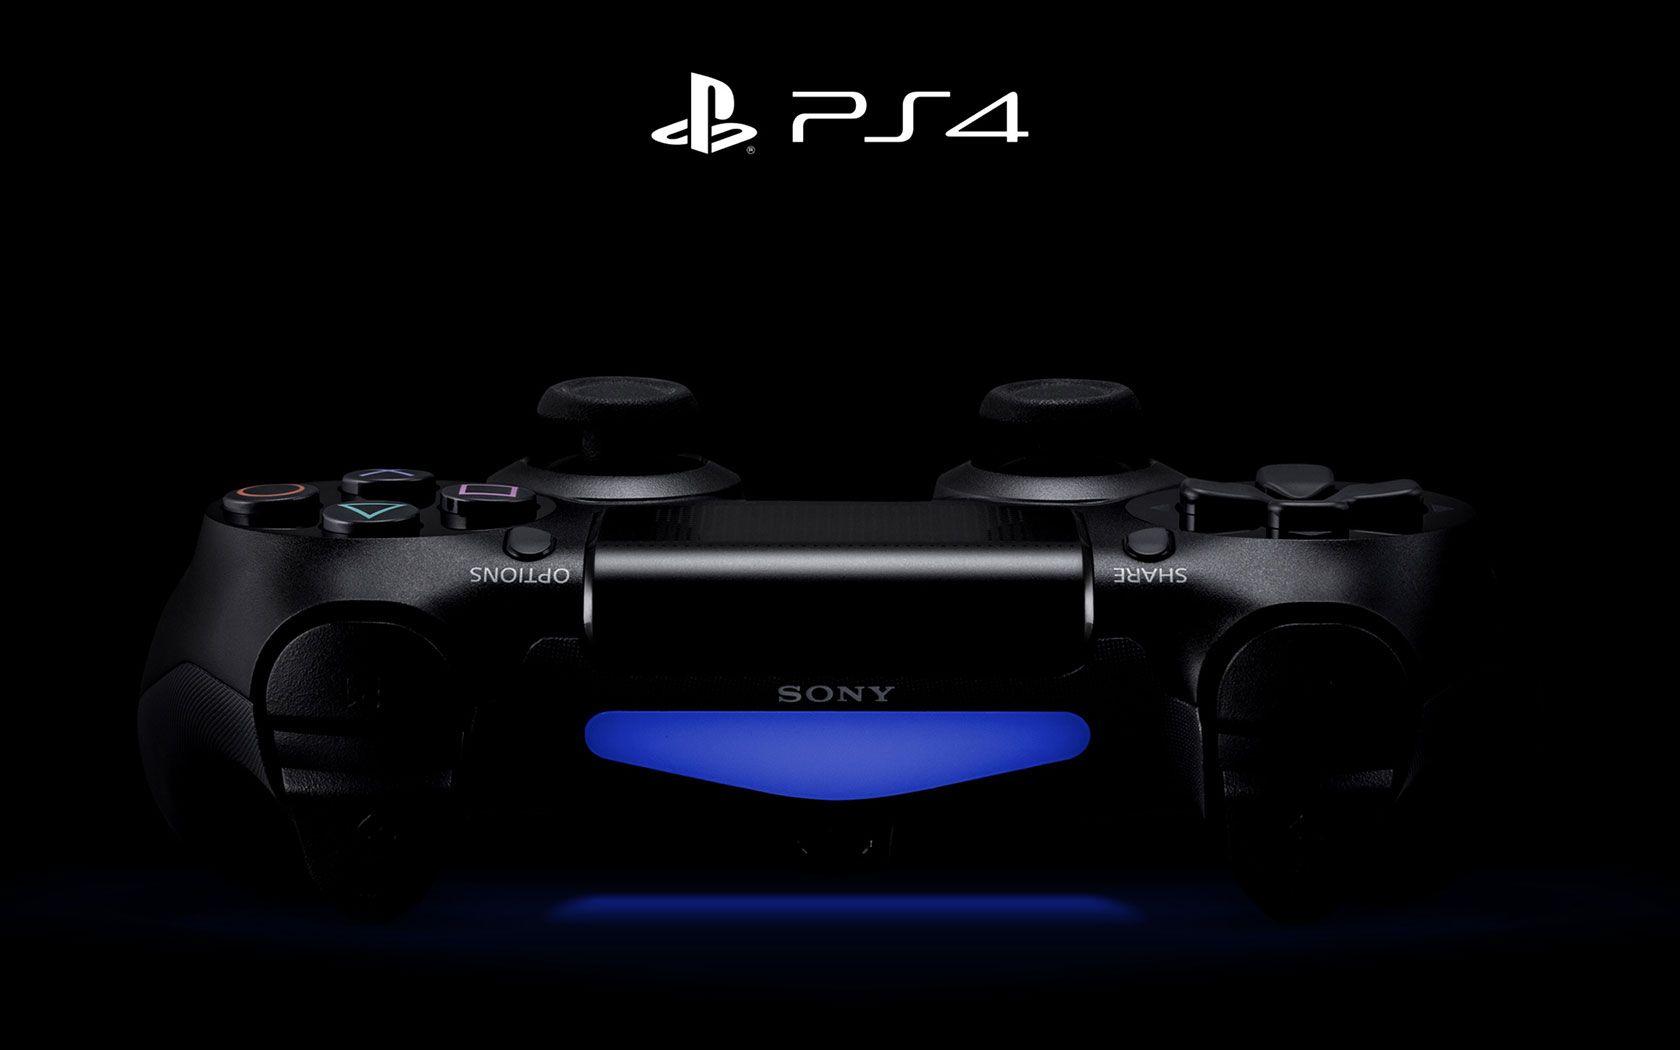 Playstation 4 Joystick Hd Wallpapers Playstation